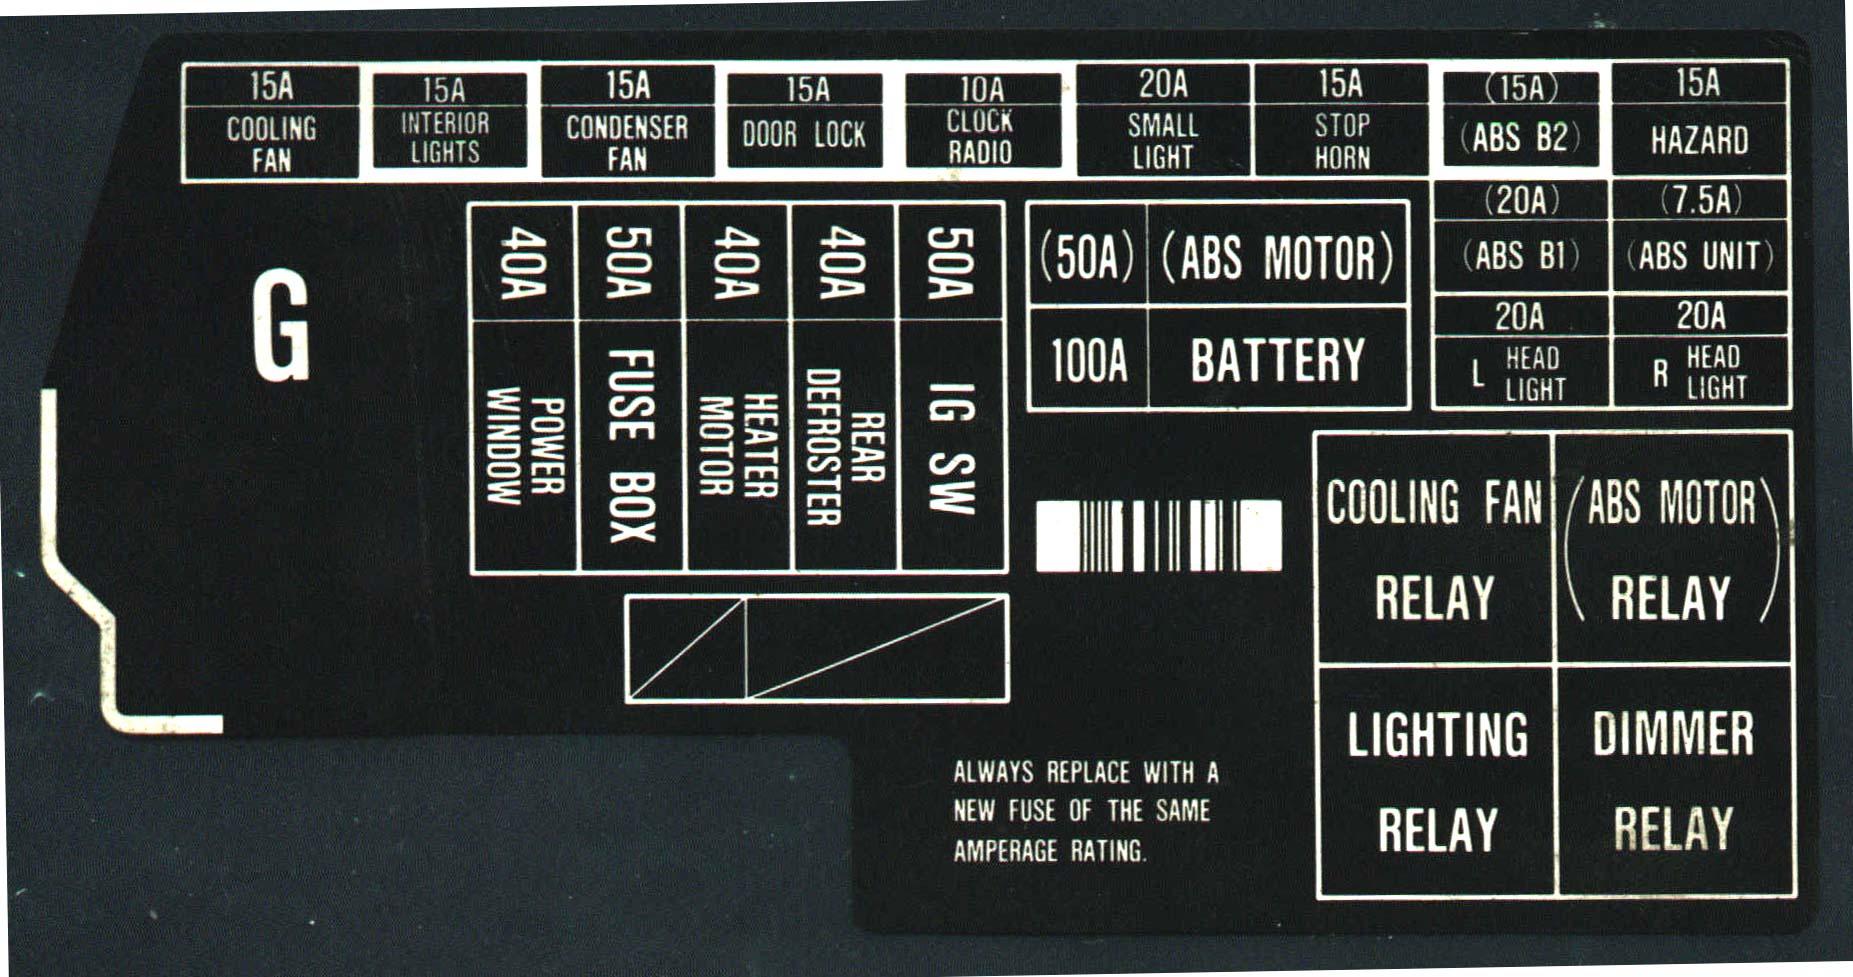 1990 Honda Prelude Fuse Box Diagram - Wiring Diagrams on 92 honda radio wiring, alternator charging schematic, alternator regulator schematic,